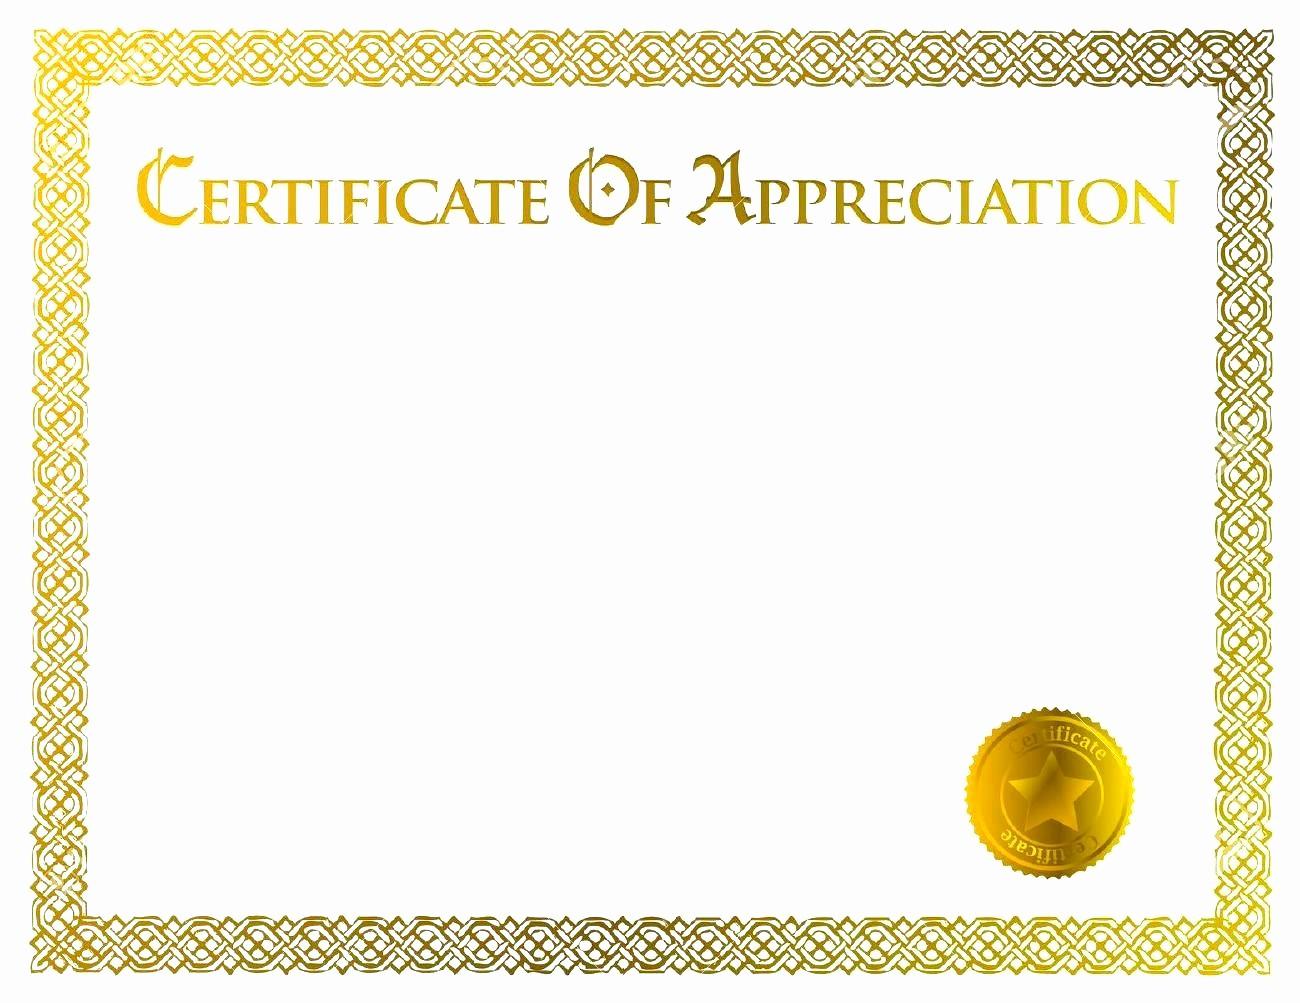 Template for Certificate Of Appreciation Beautiful Blank Certificate Appreciation Templates